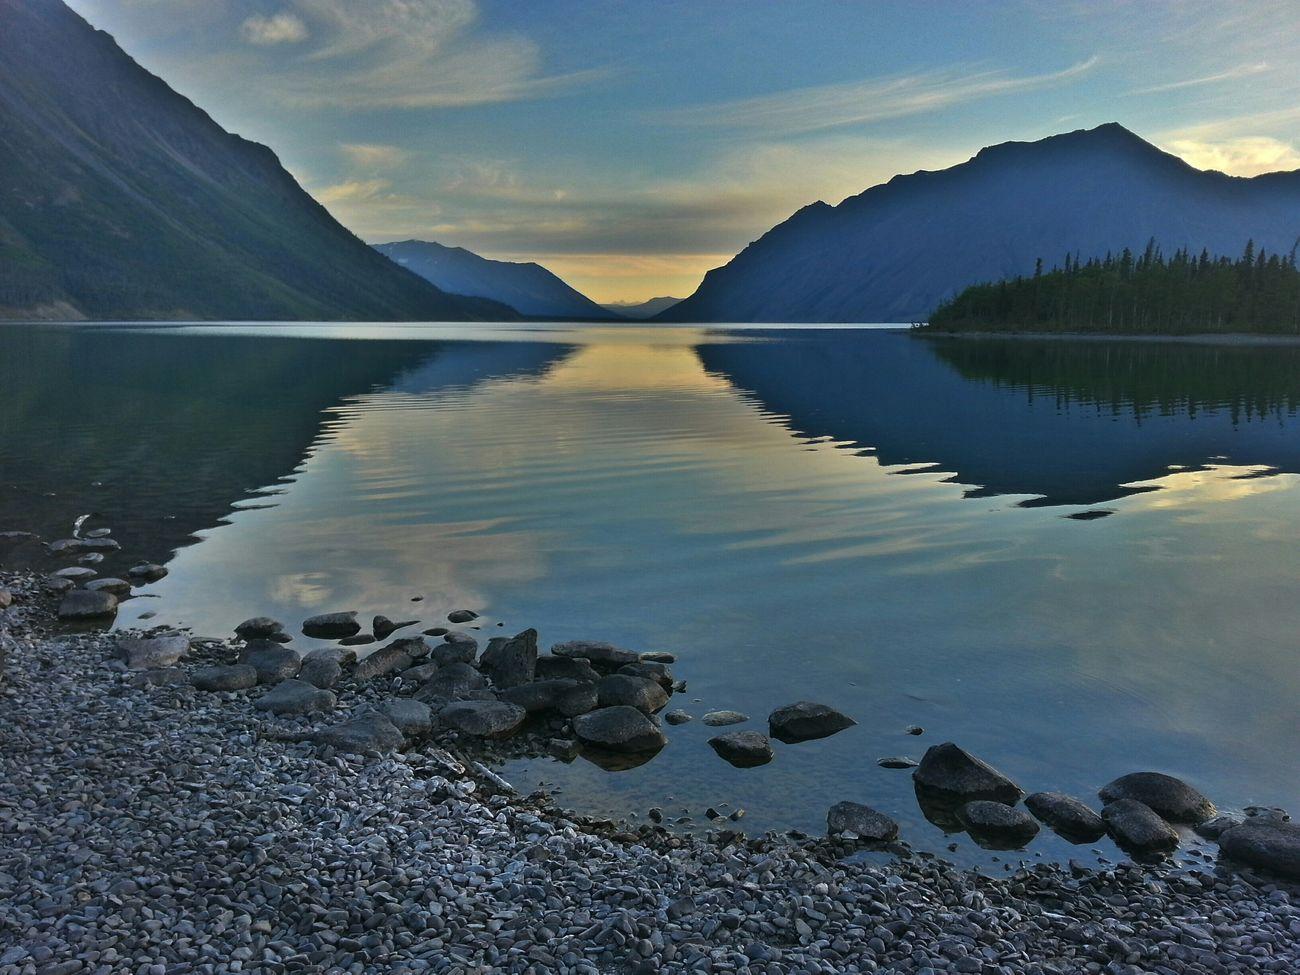 Hdr_Collection Samsung Galaxy S III Canada Coast To Coast Yukon Kluane National Park & Reserve Vacation